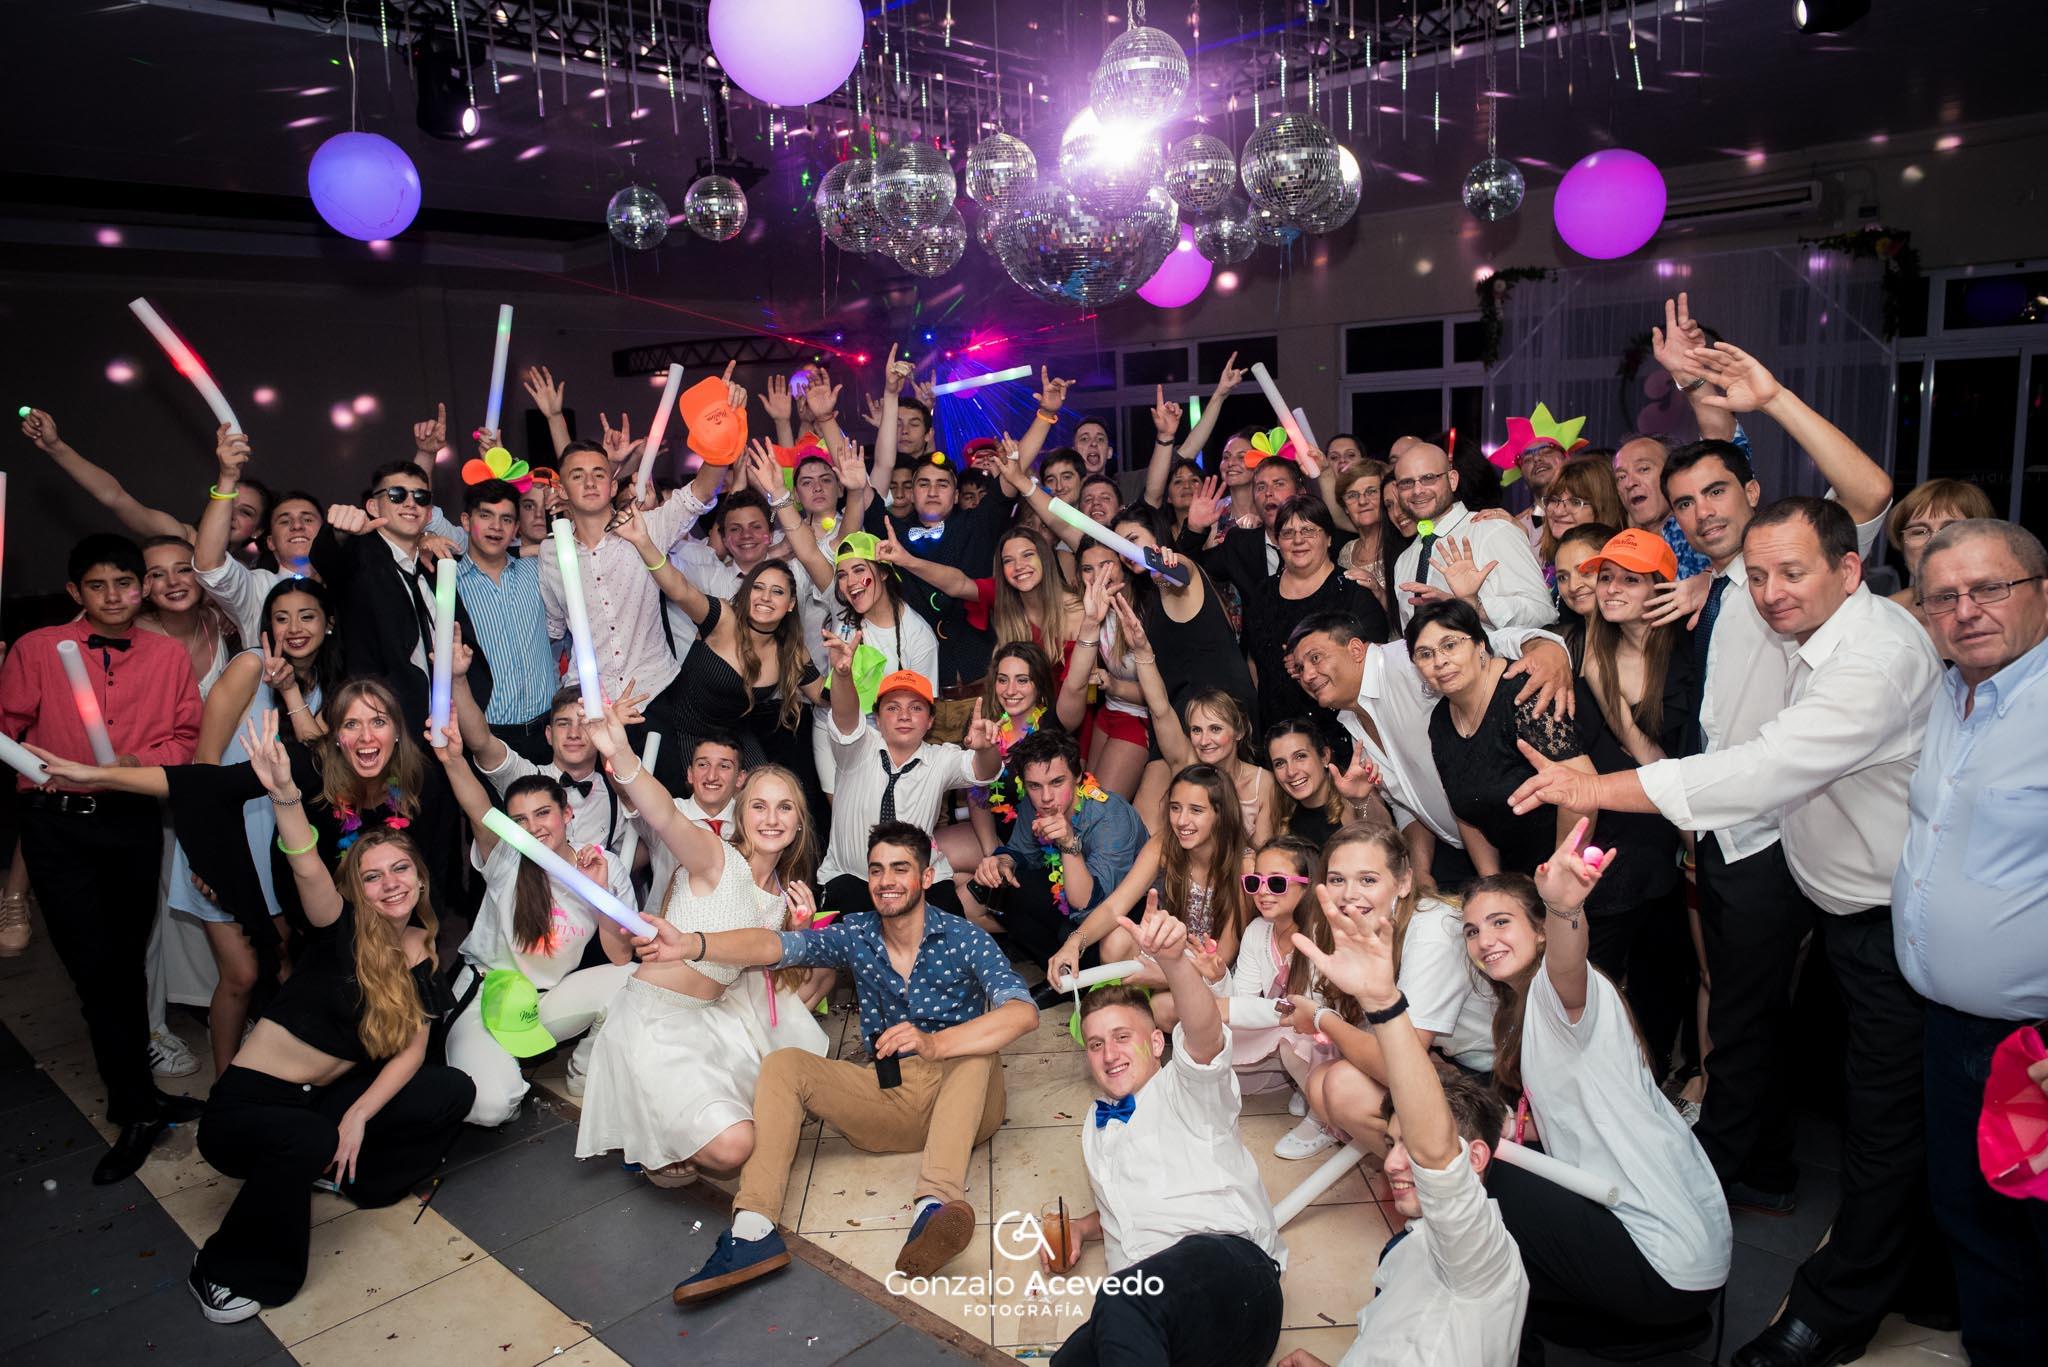 Marti book de 15 fifteens baile cotillon alegria fiesta ideas geniales originales #gonzaloacevedofotografia gonzalo acevedo